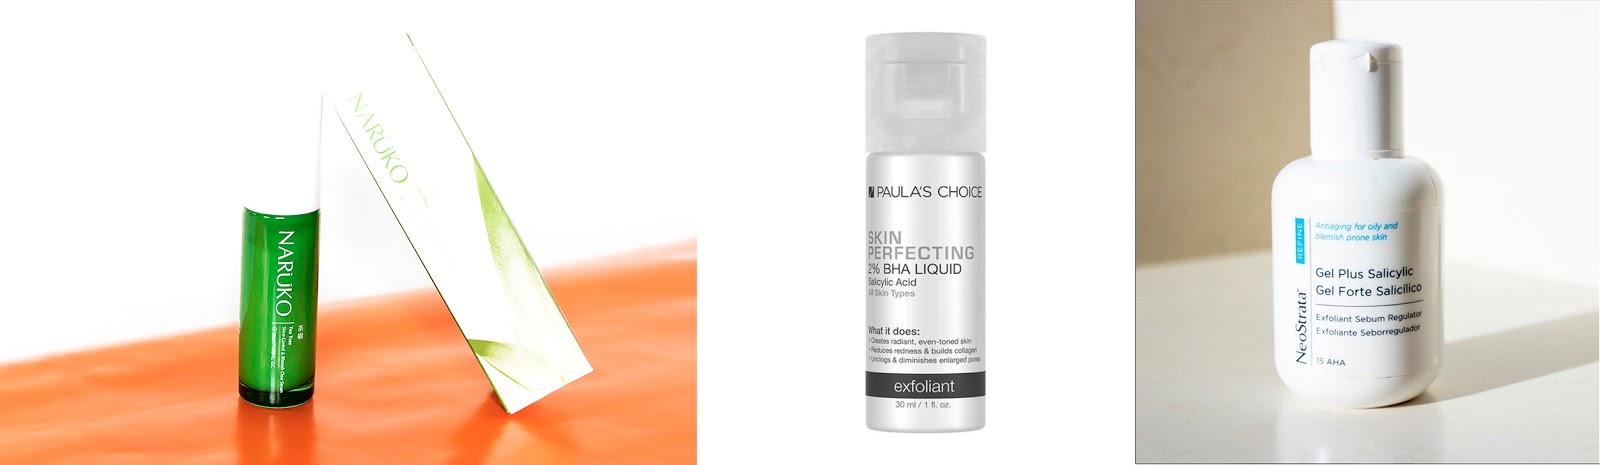 Productos con BHA para pieles grasas